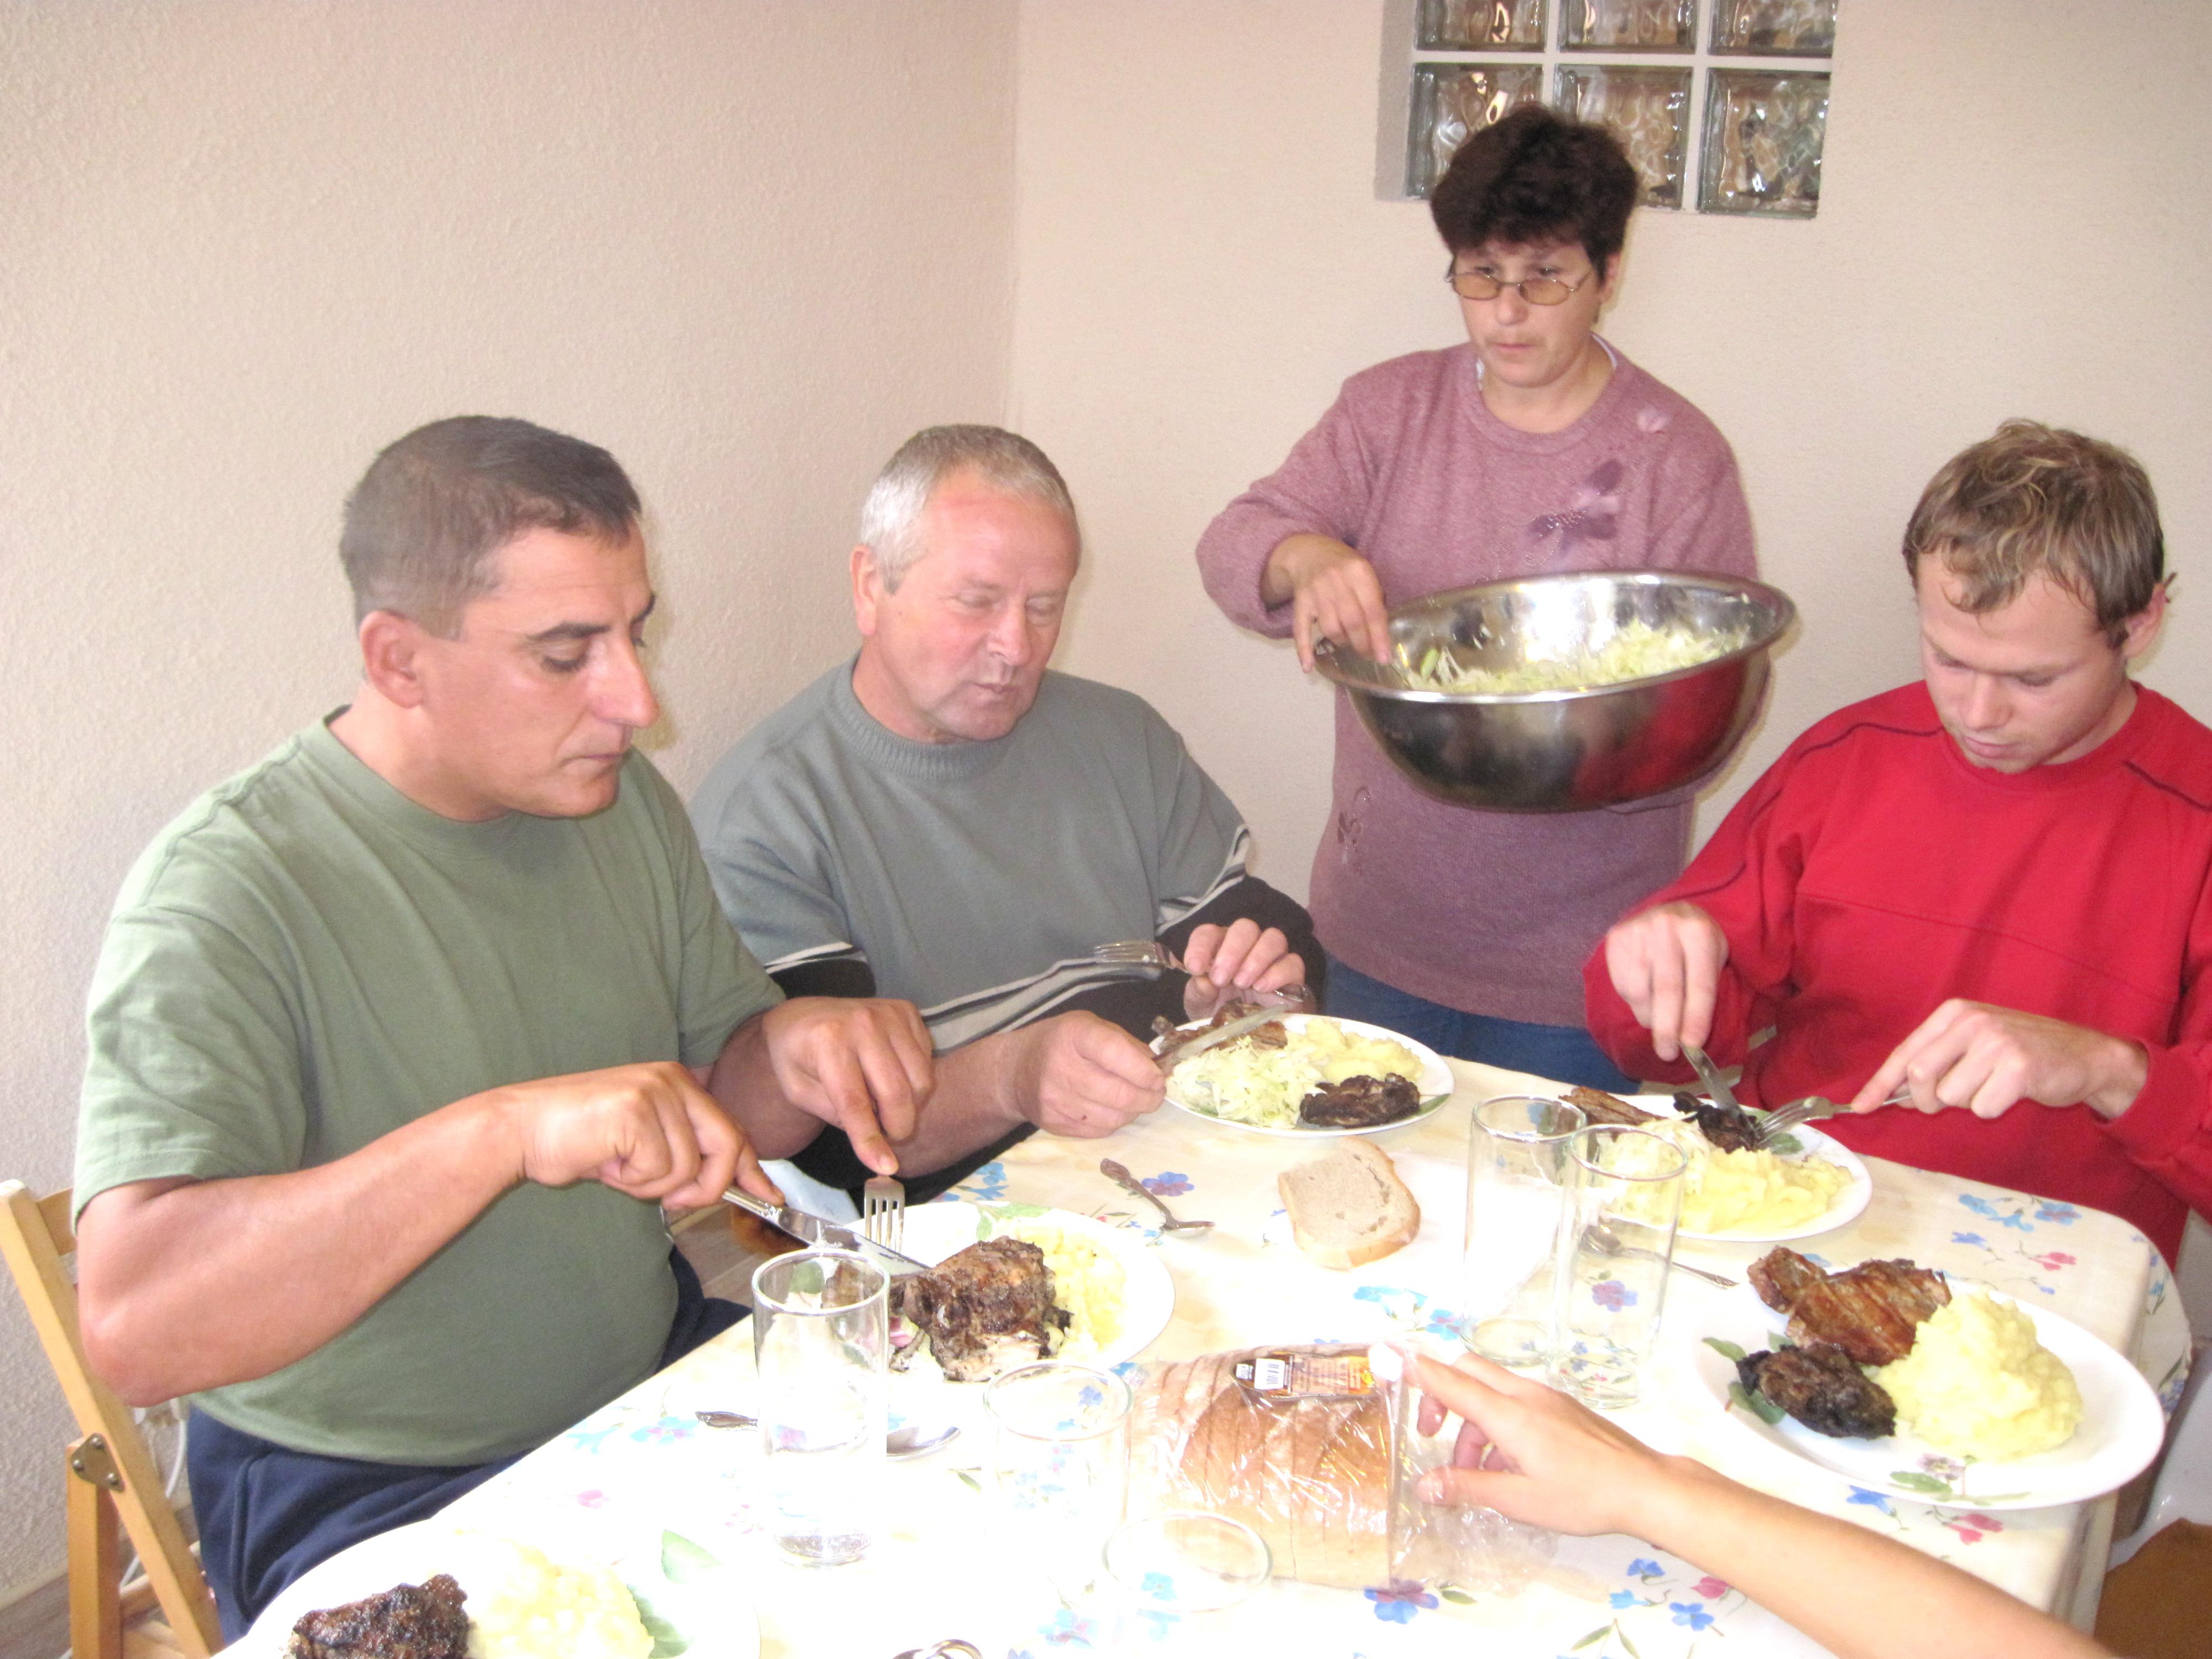 Sebastian, Vasili & Marti let Mimi serve them some slaw.  (Sebastian grilled the meat outdoors in the rain!)